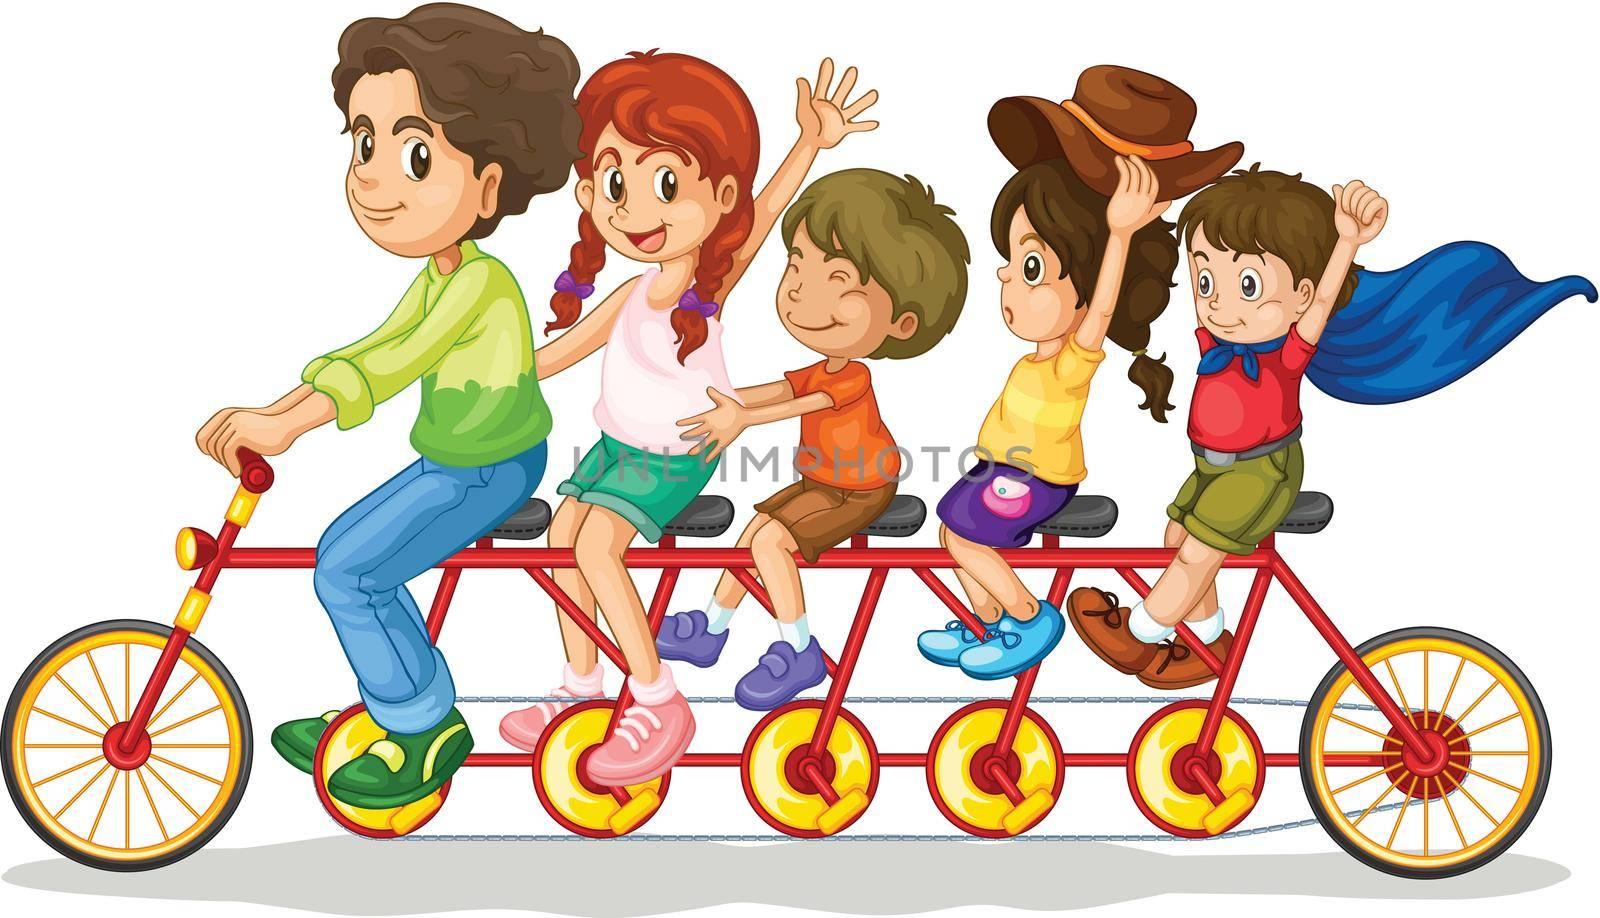 Family teamwork on a multiple seat bike